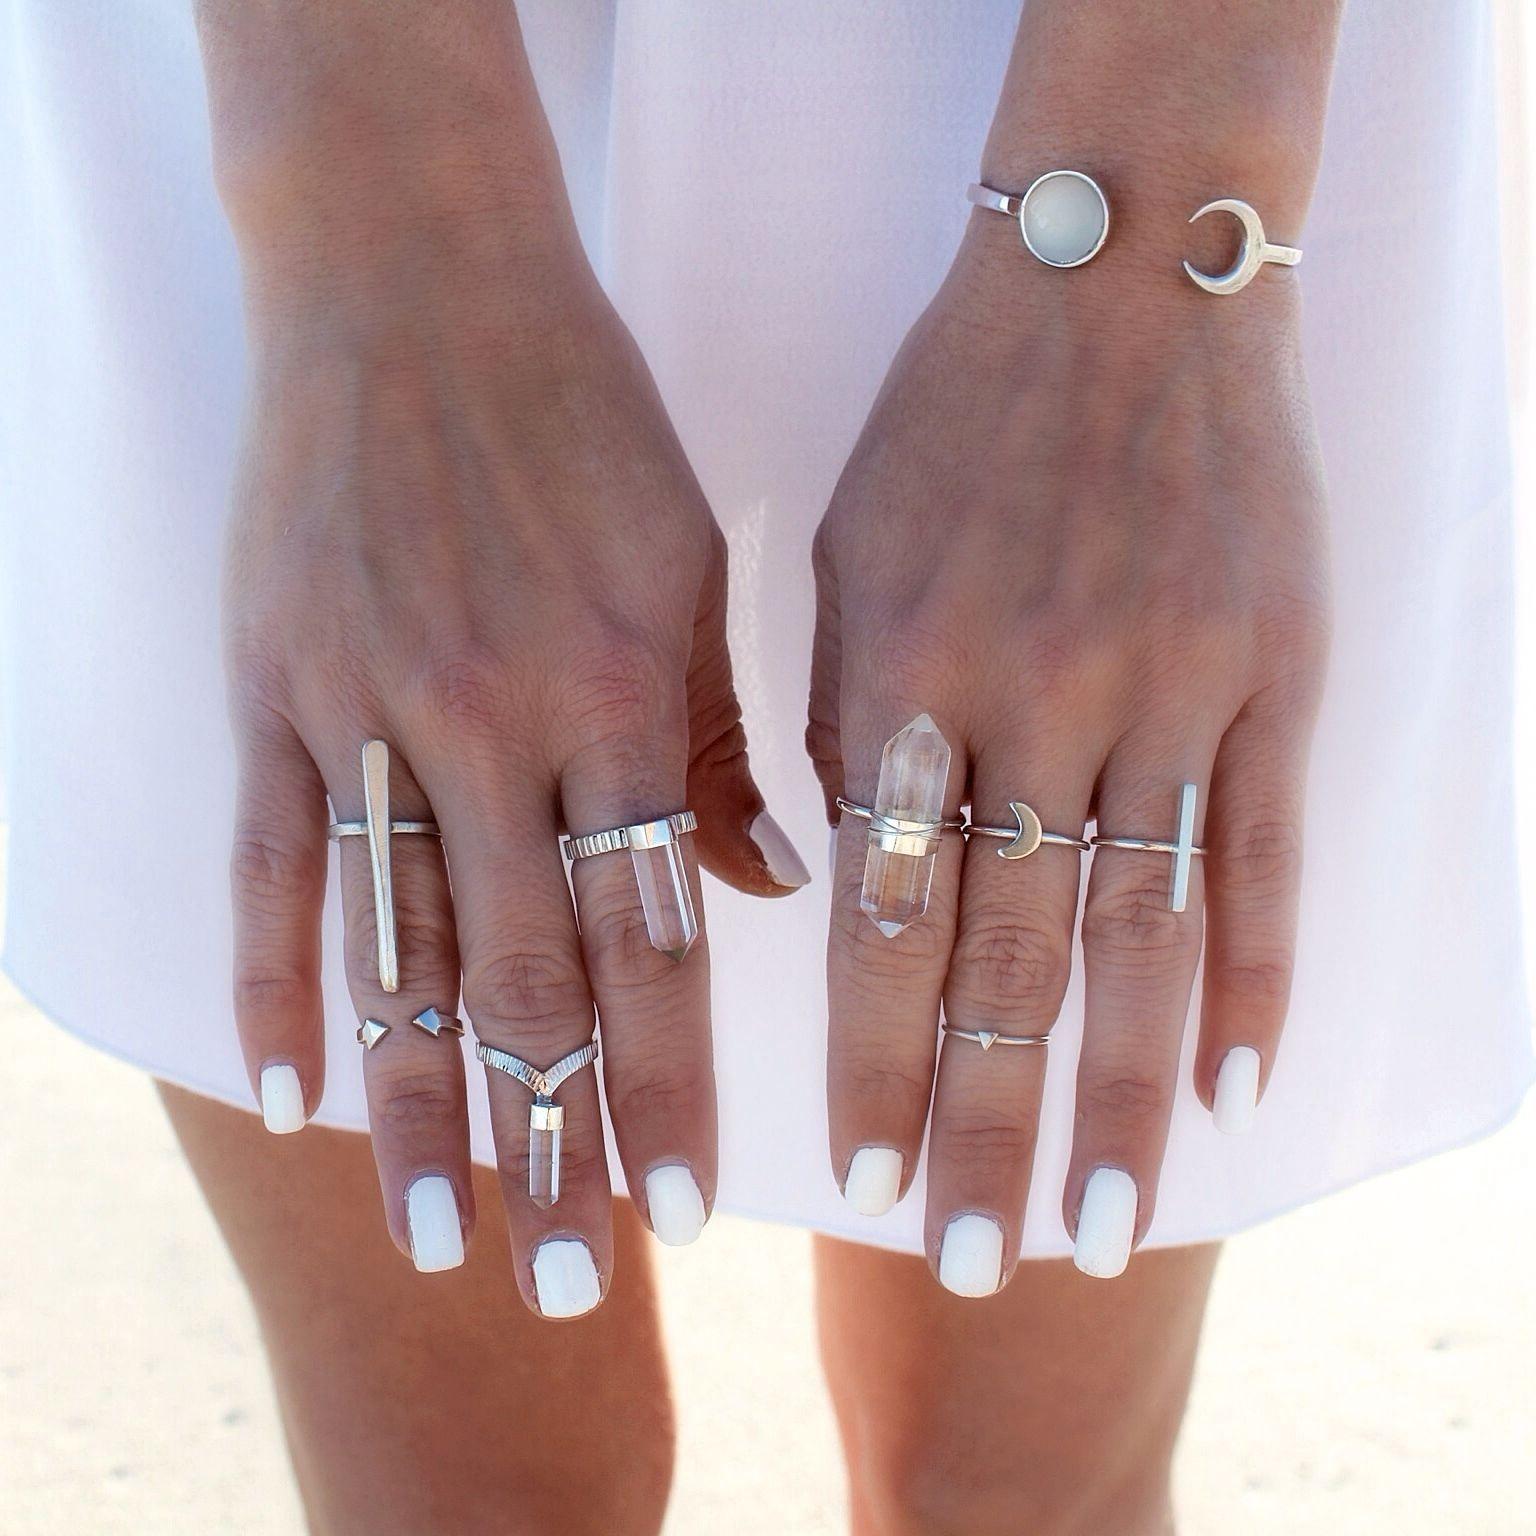 ringar naglar vita Silverringar e120cd0e453c7